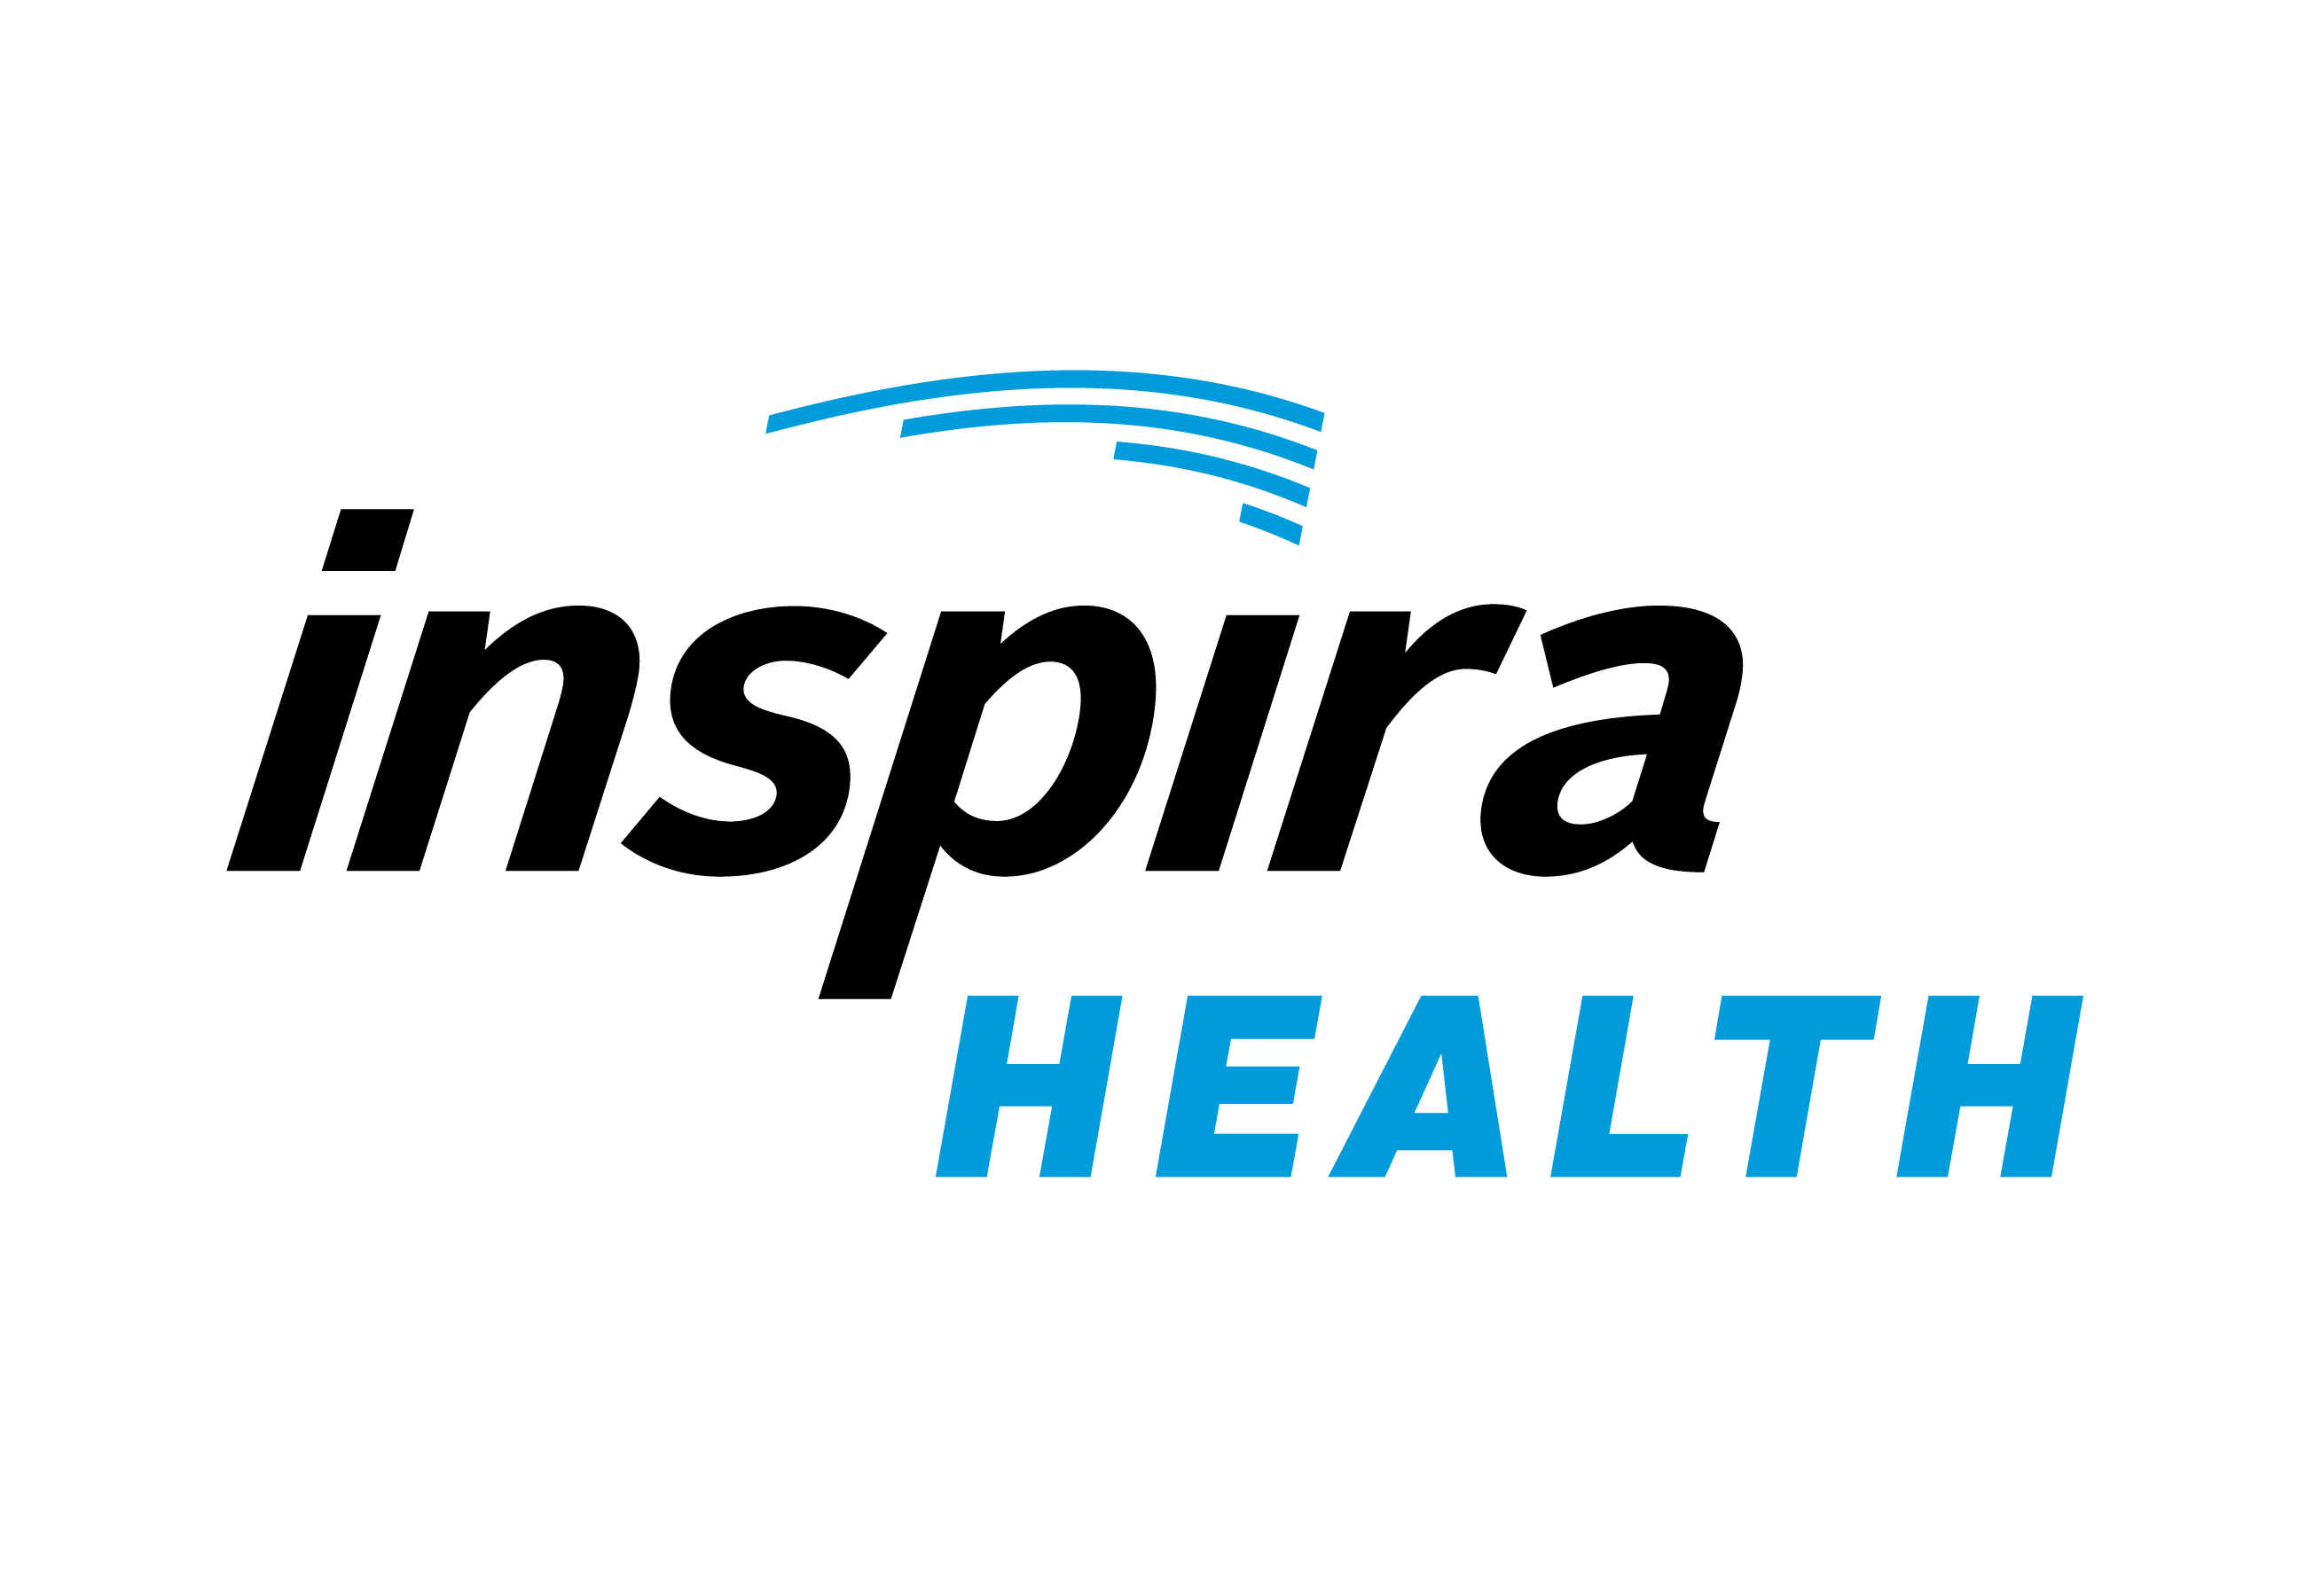 Inspira Health Logo_Vertical Treatment_Process Black and Process Blue C